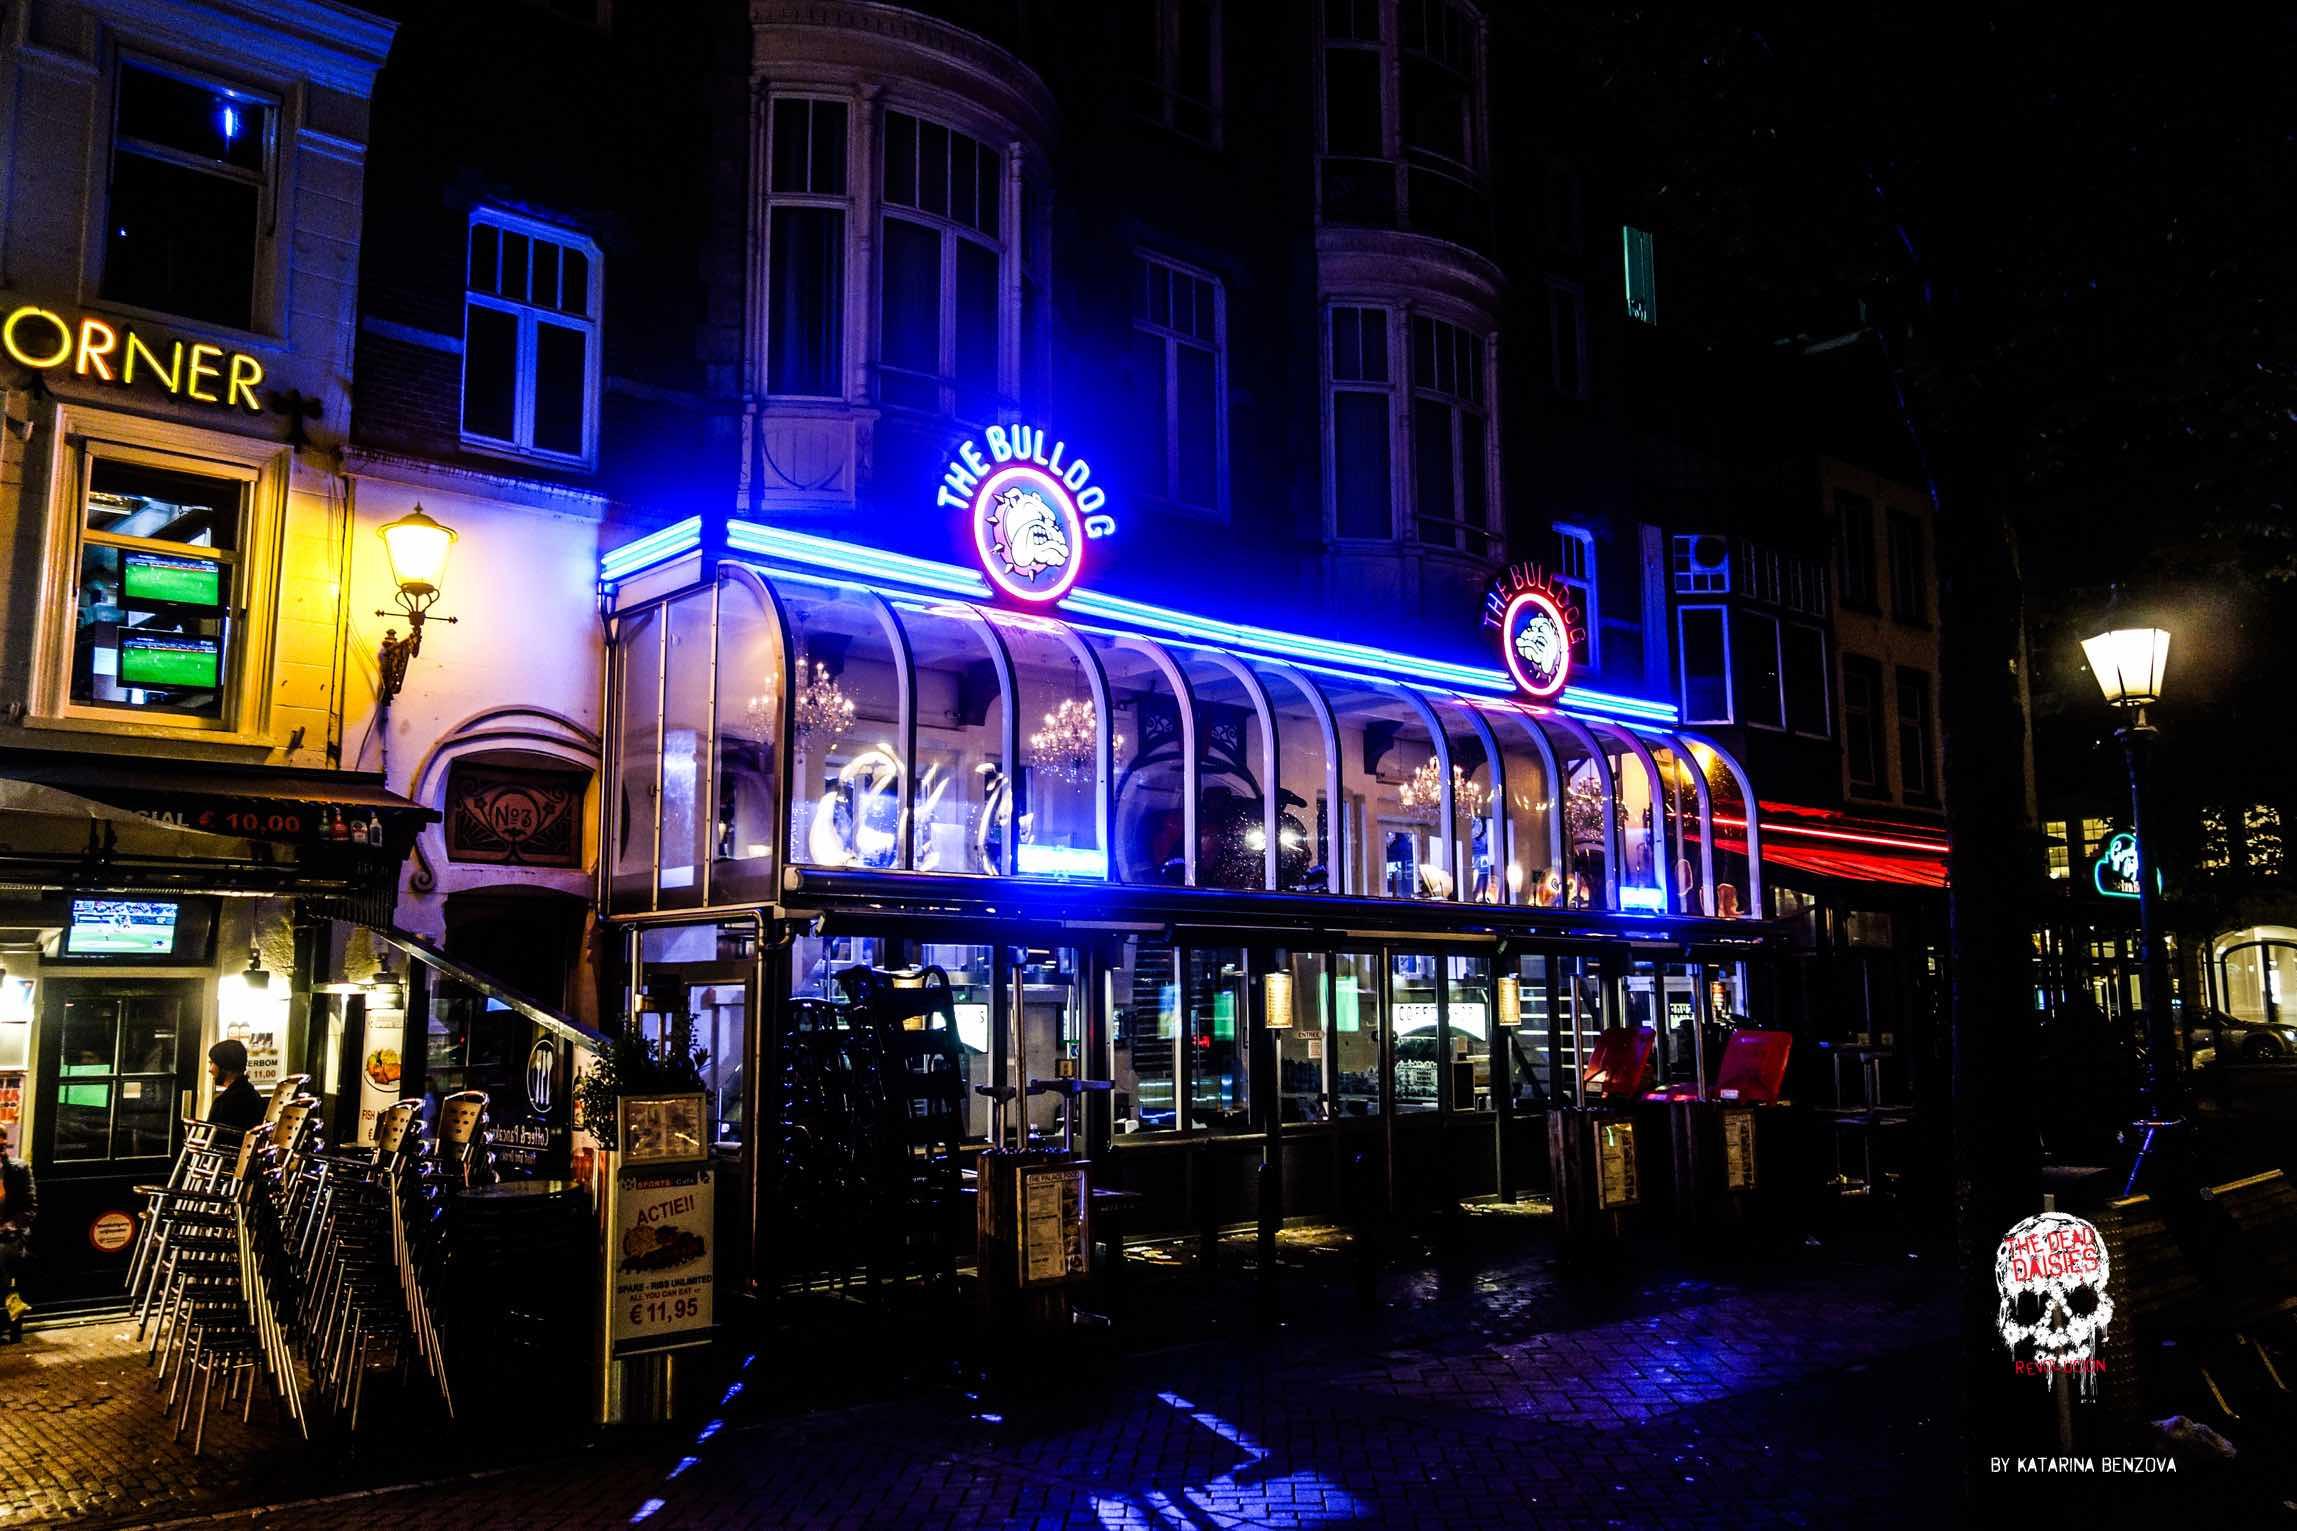 Day 20, Day Off, Amsterdam